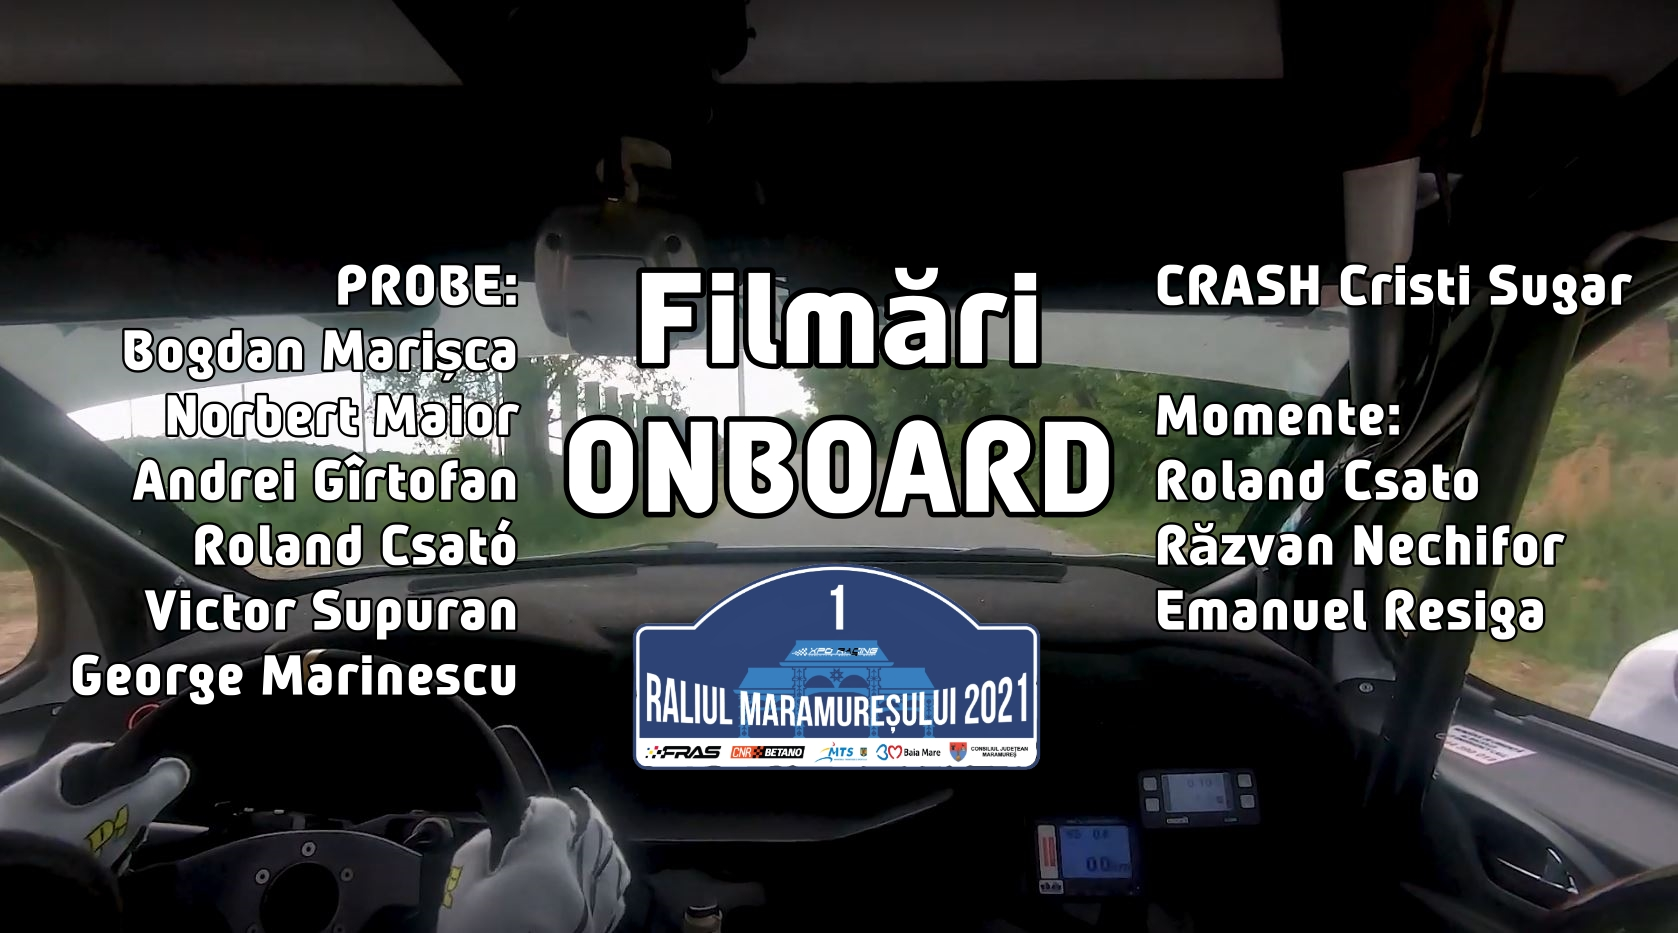 Raliul Maramureșului 2021 – Onboard Action